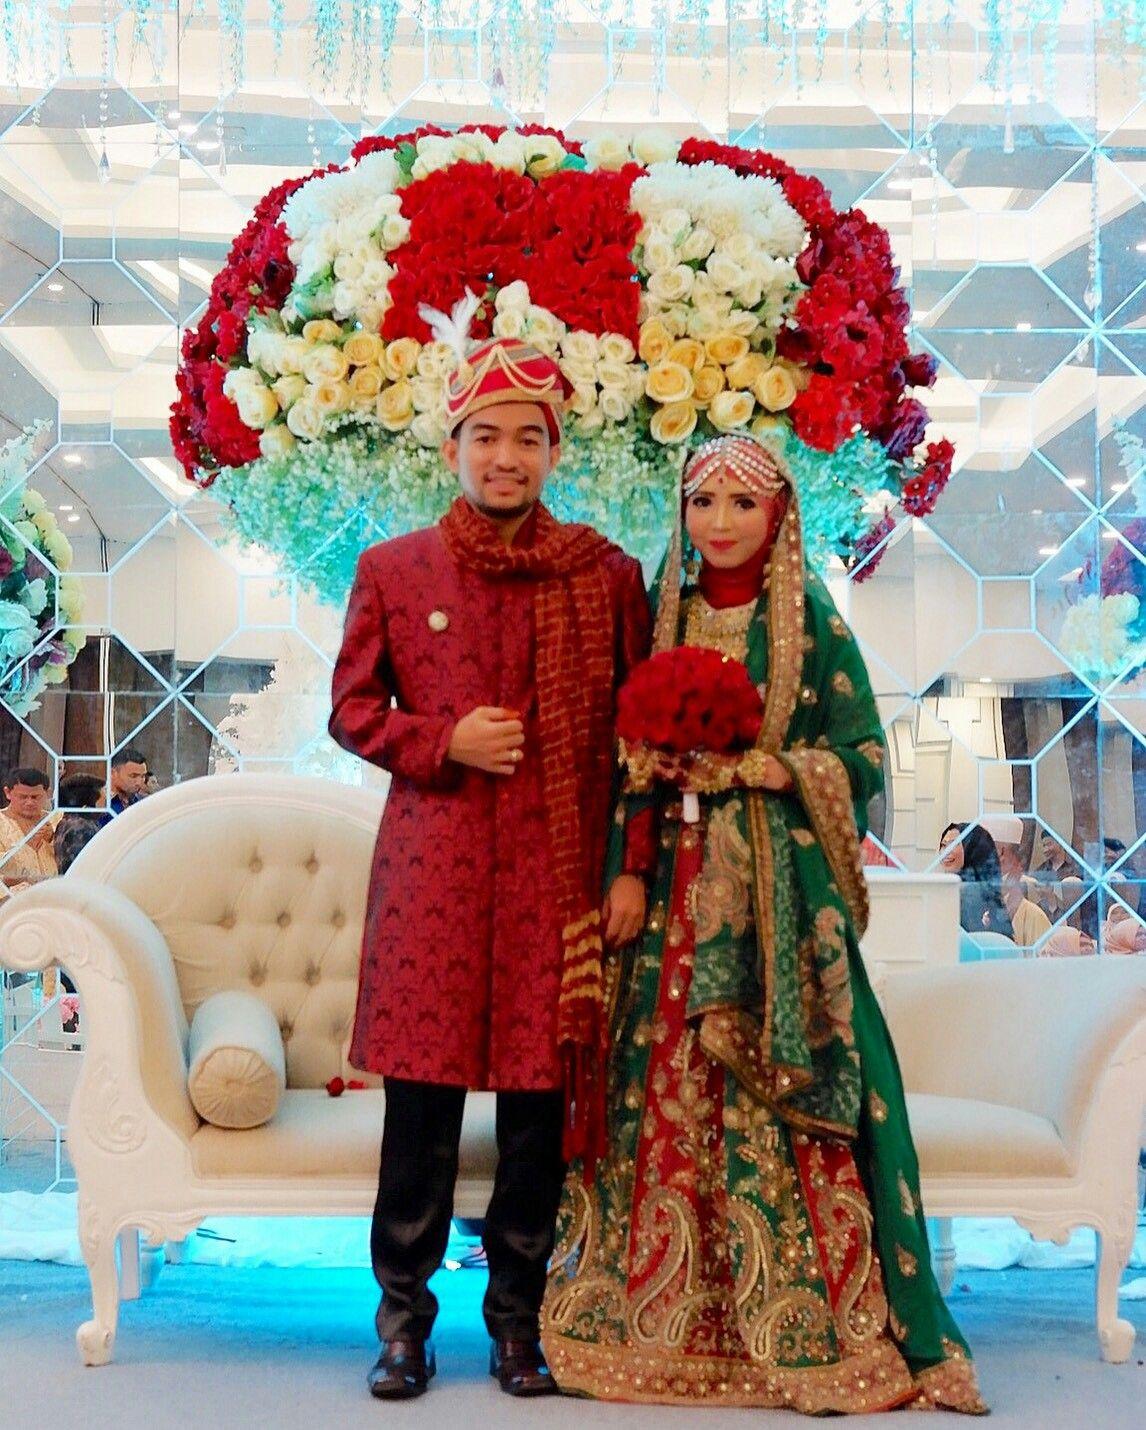 India wedding makeup artist by house of amaree decor by wati india wedding makeup artist by house of amaree decor by wati flower venue by hotel grand junglespirit Choice Image